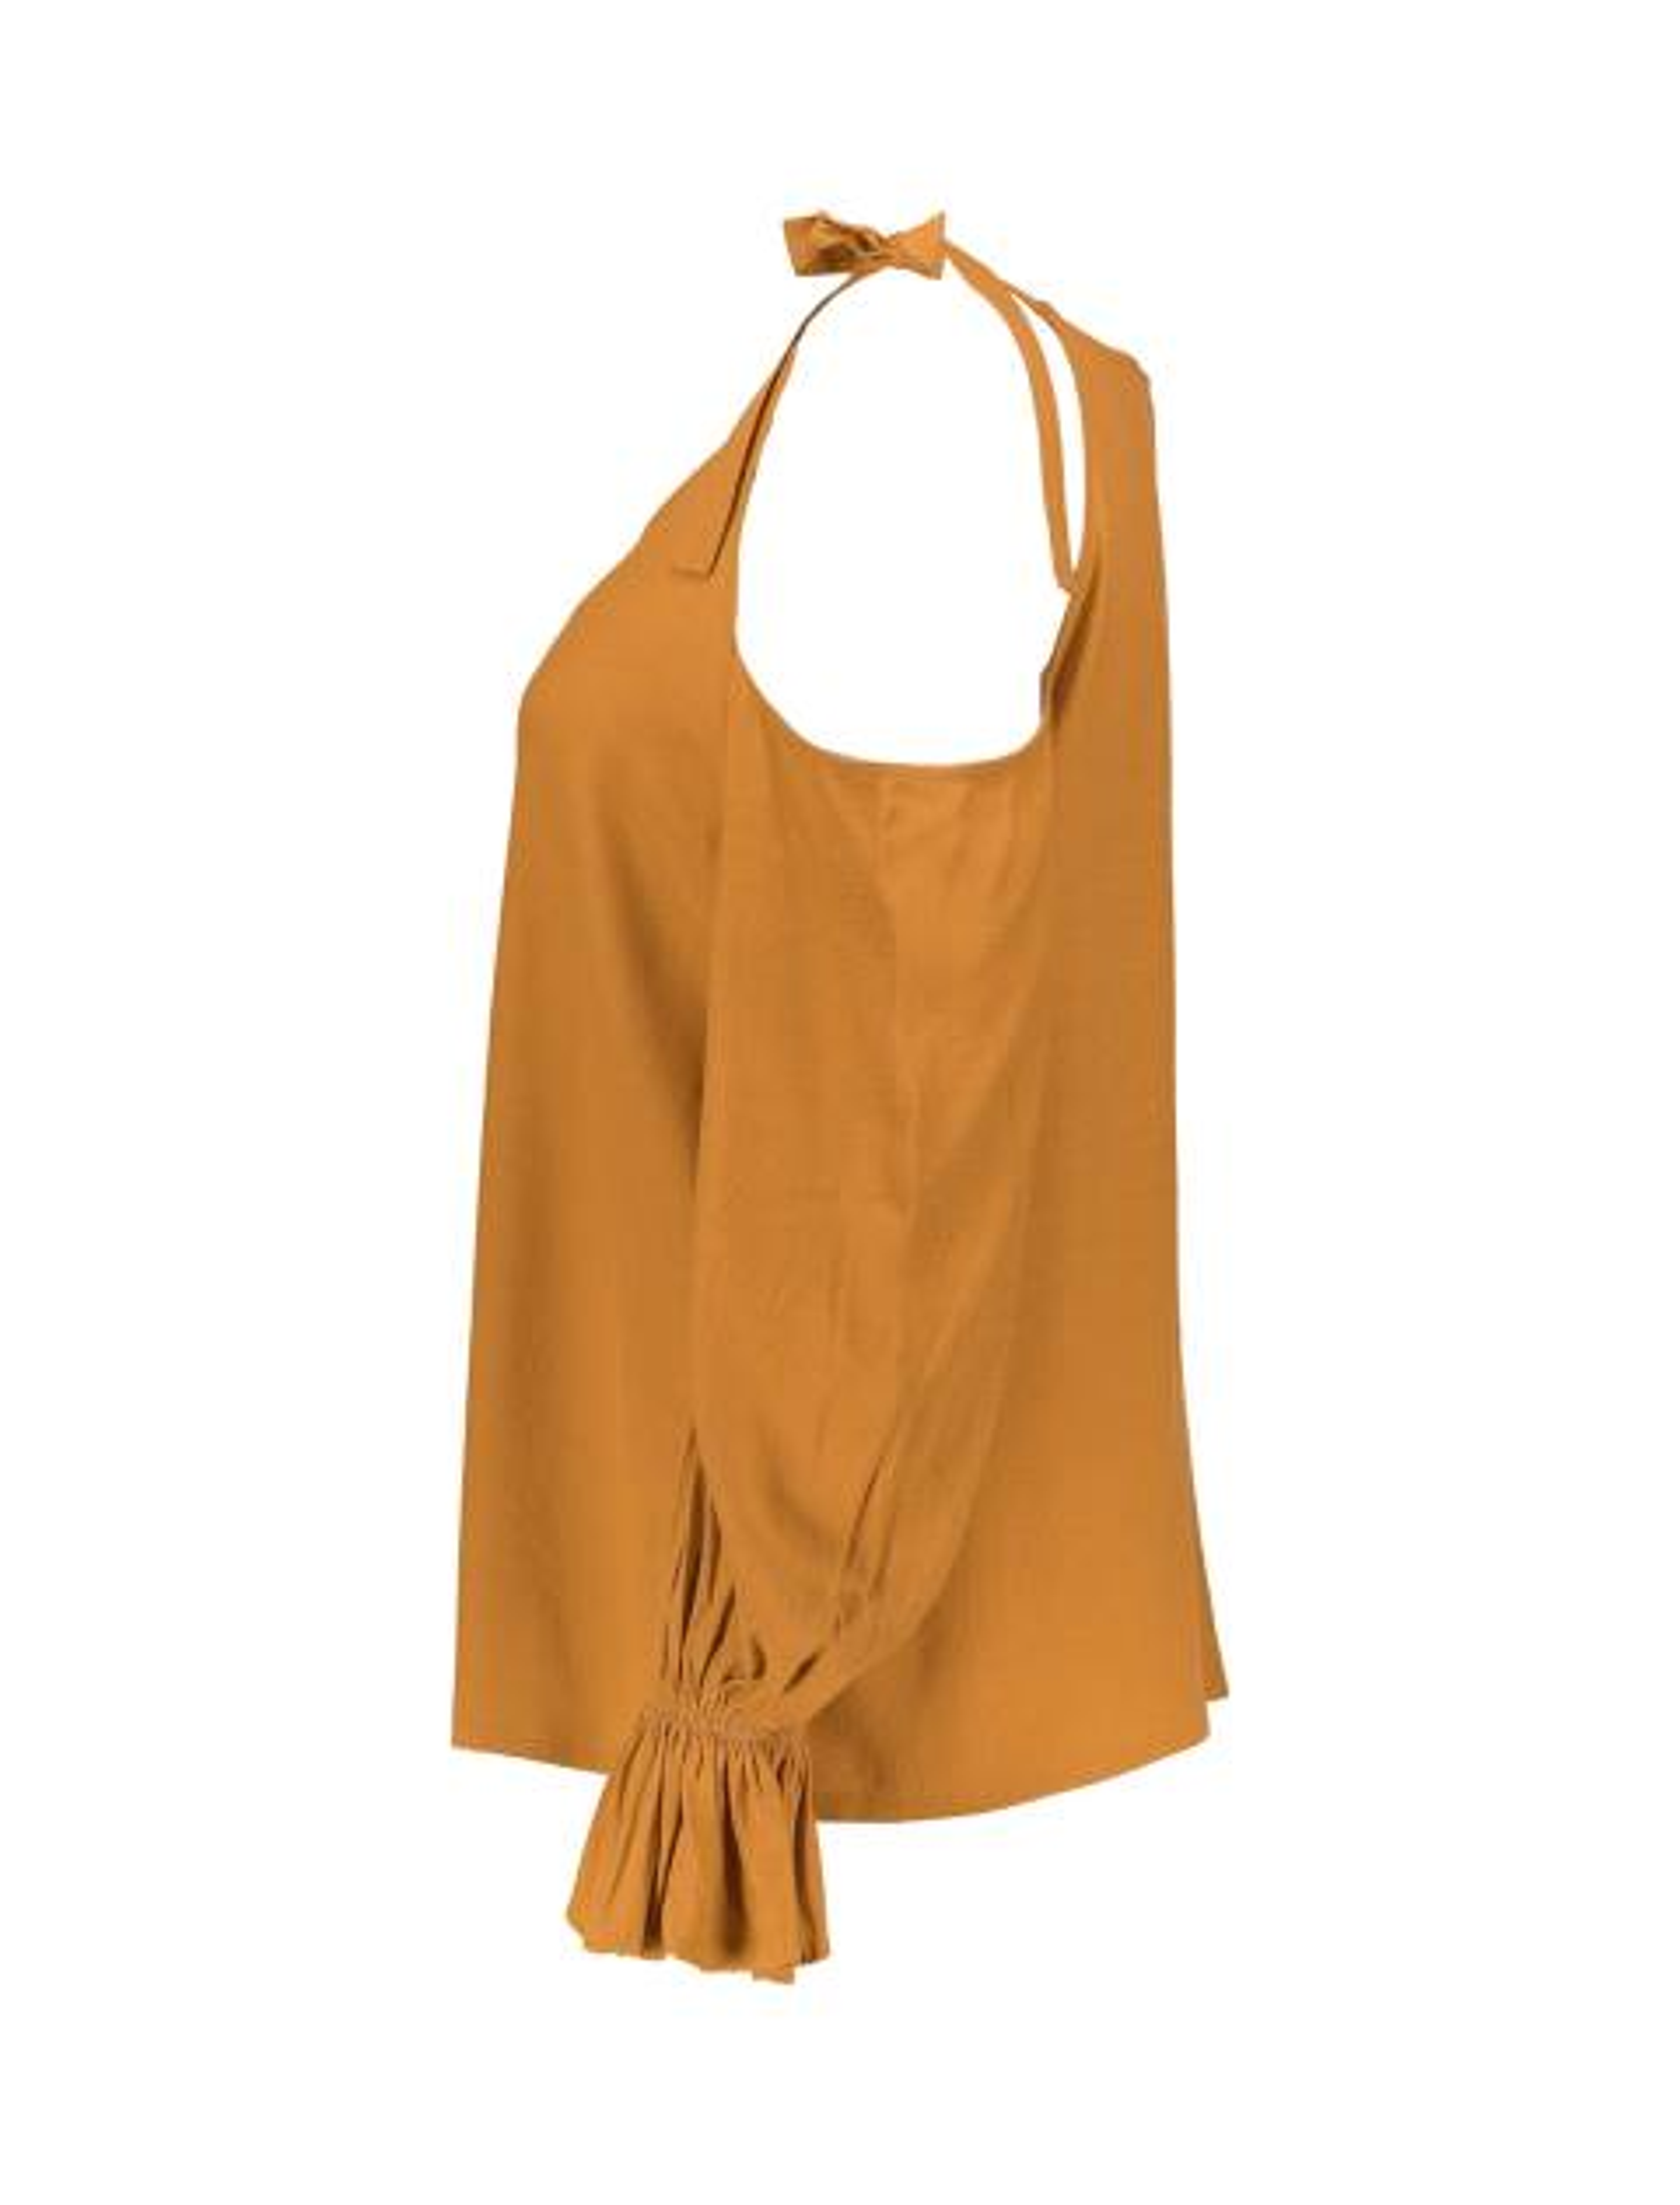 بلوز ویسکوز آستین بلند زنانه - نارنجي - 4